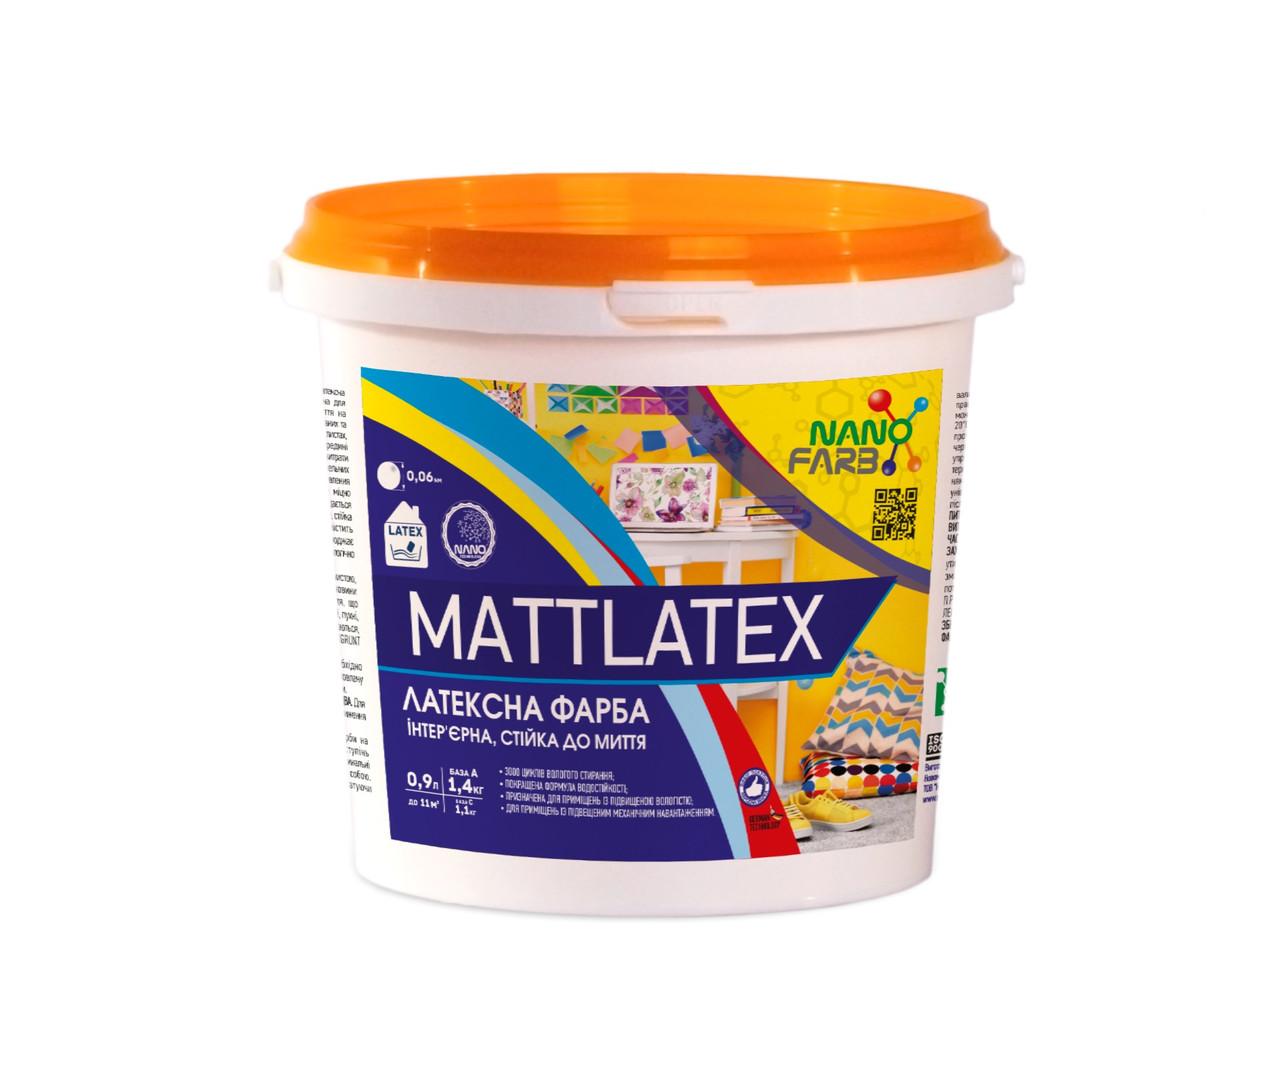 Нанофарб Mattlatex краска моющаяся 14 кг